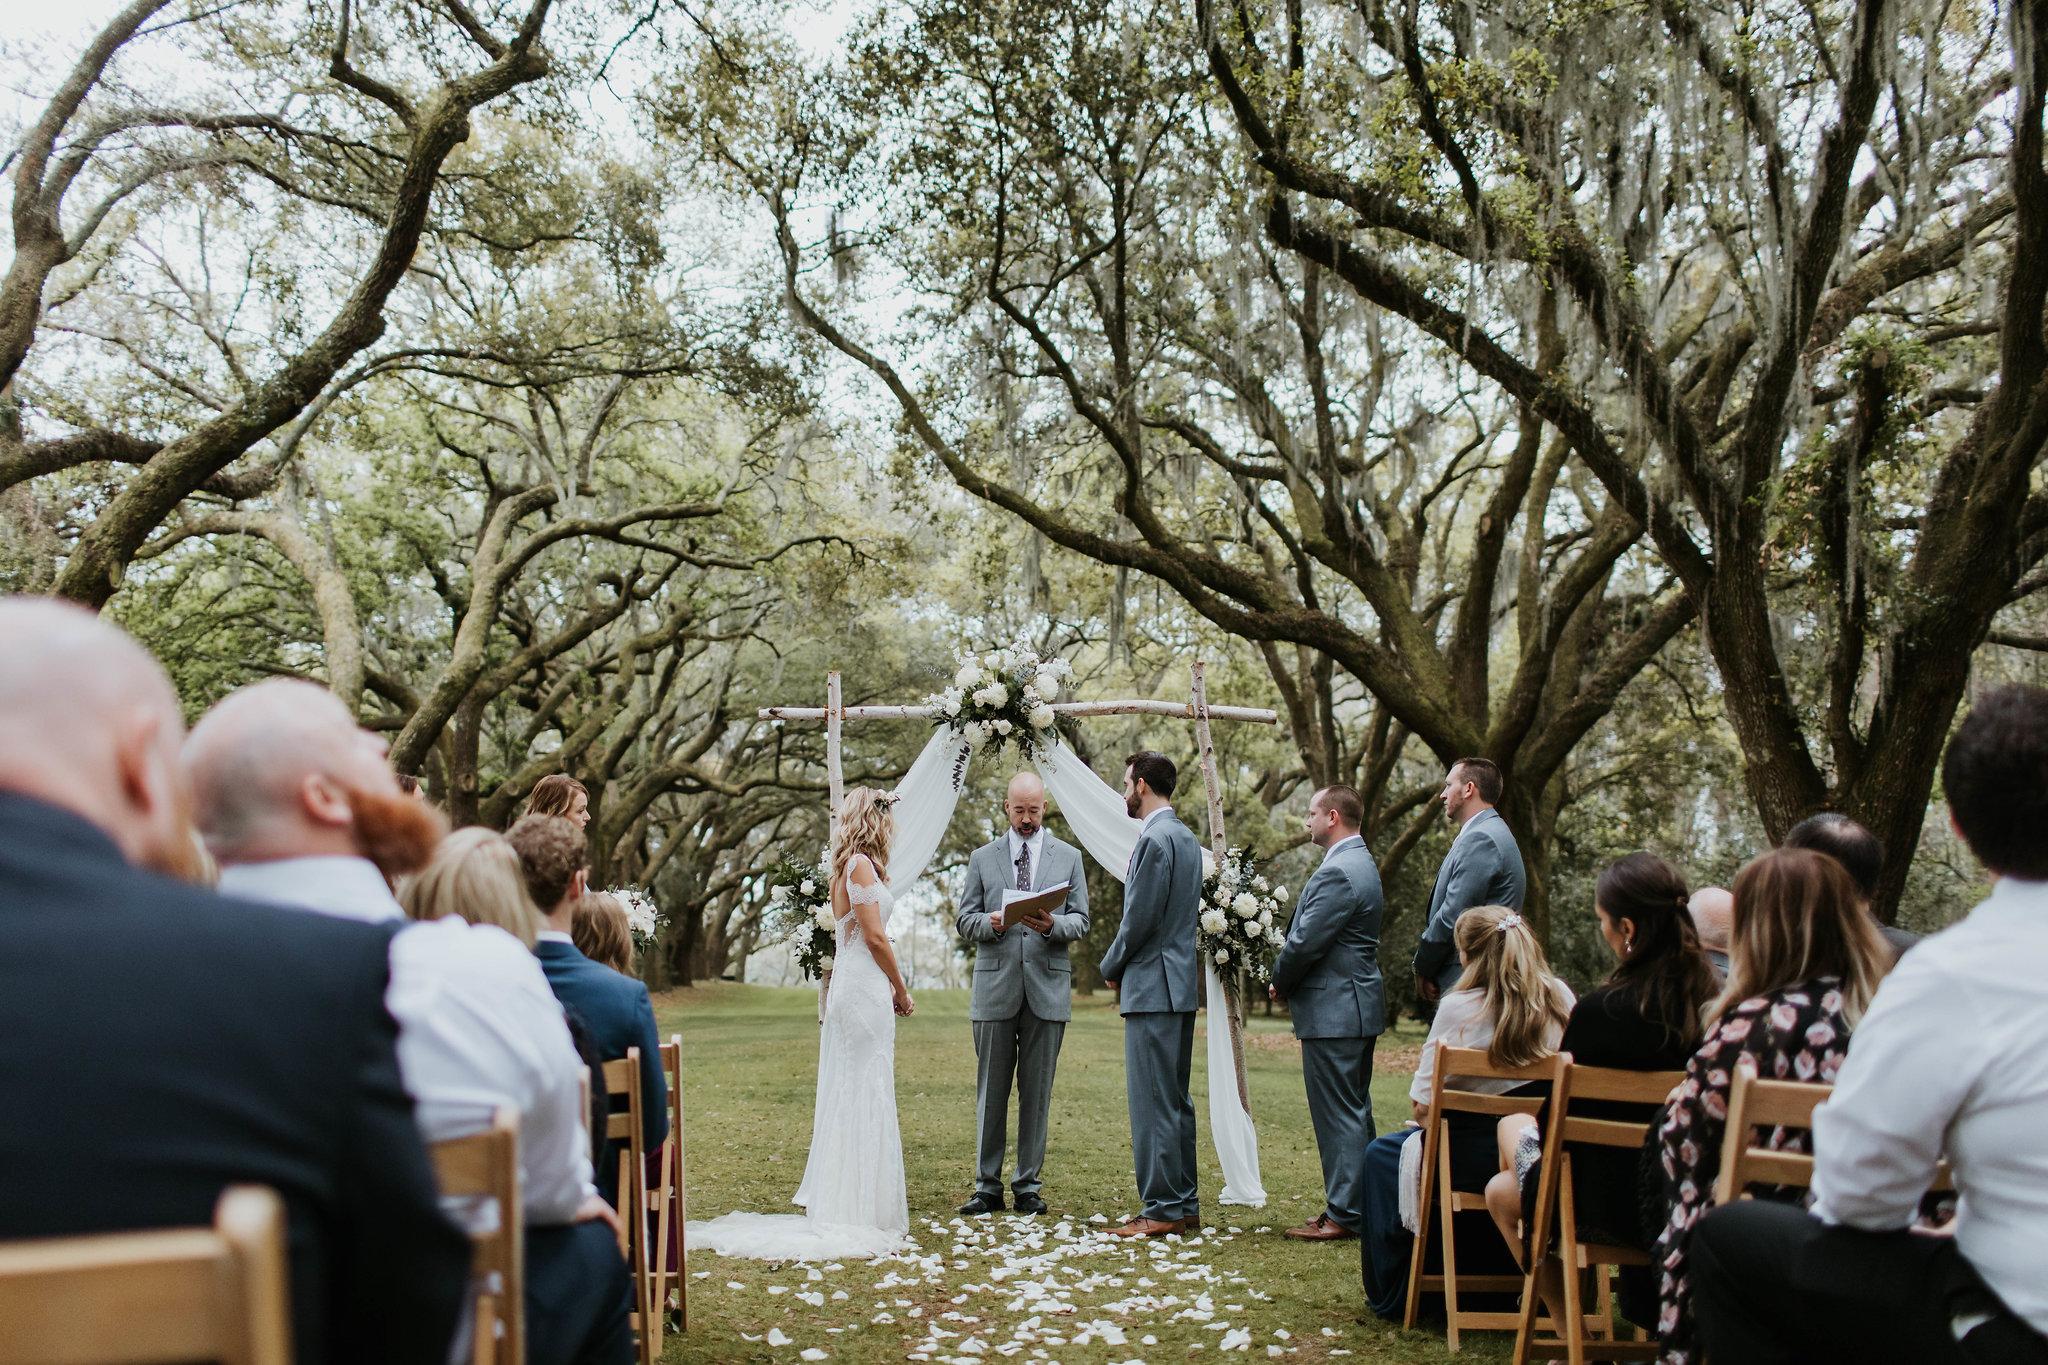 Legare-Waring-House-Charleston-SC-wedding-portrait-photography-151.jpg